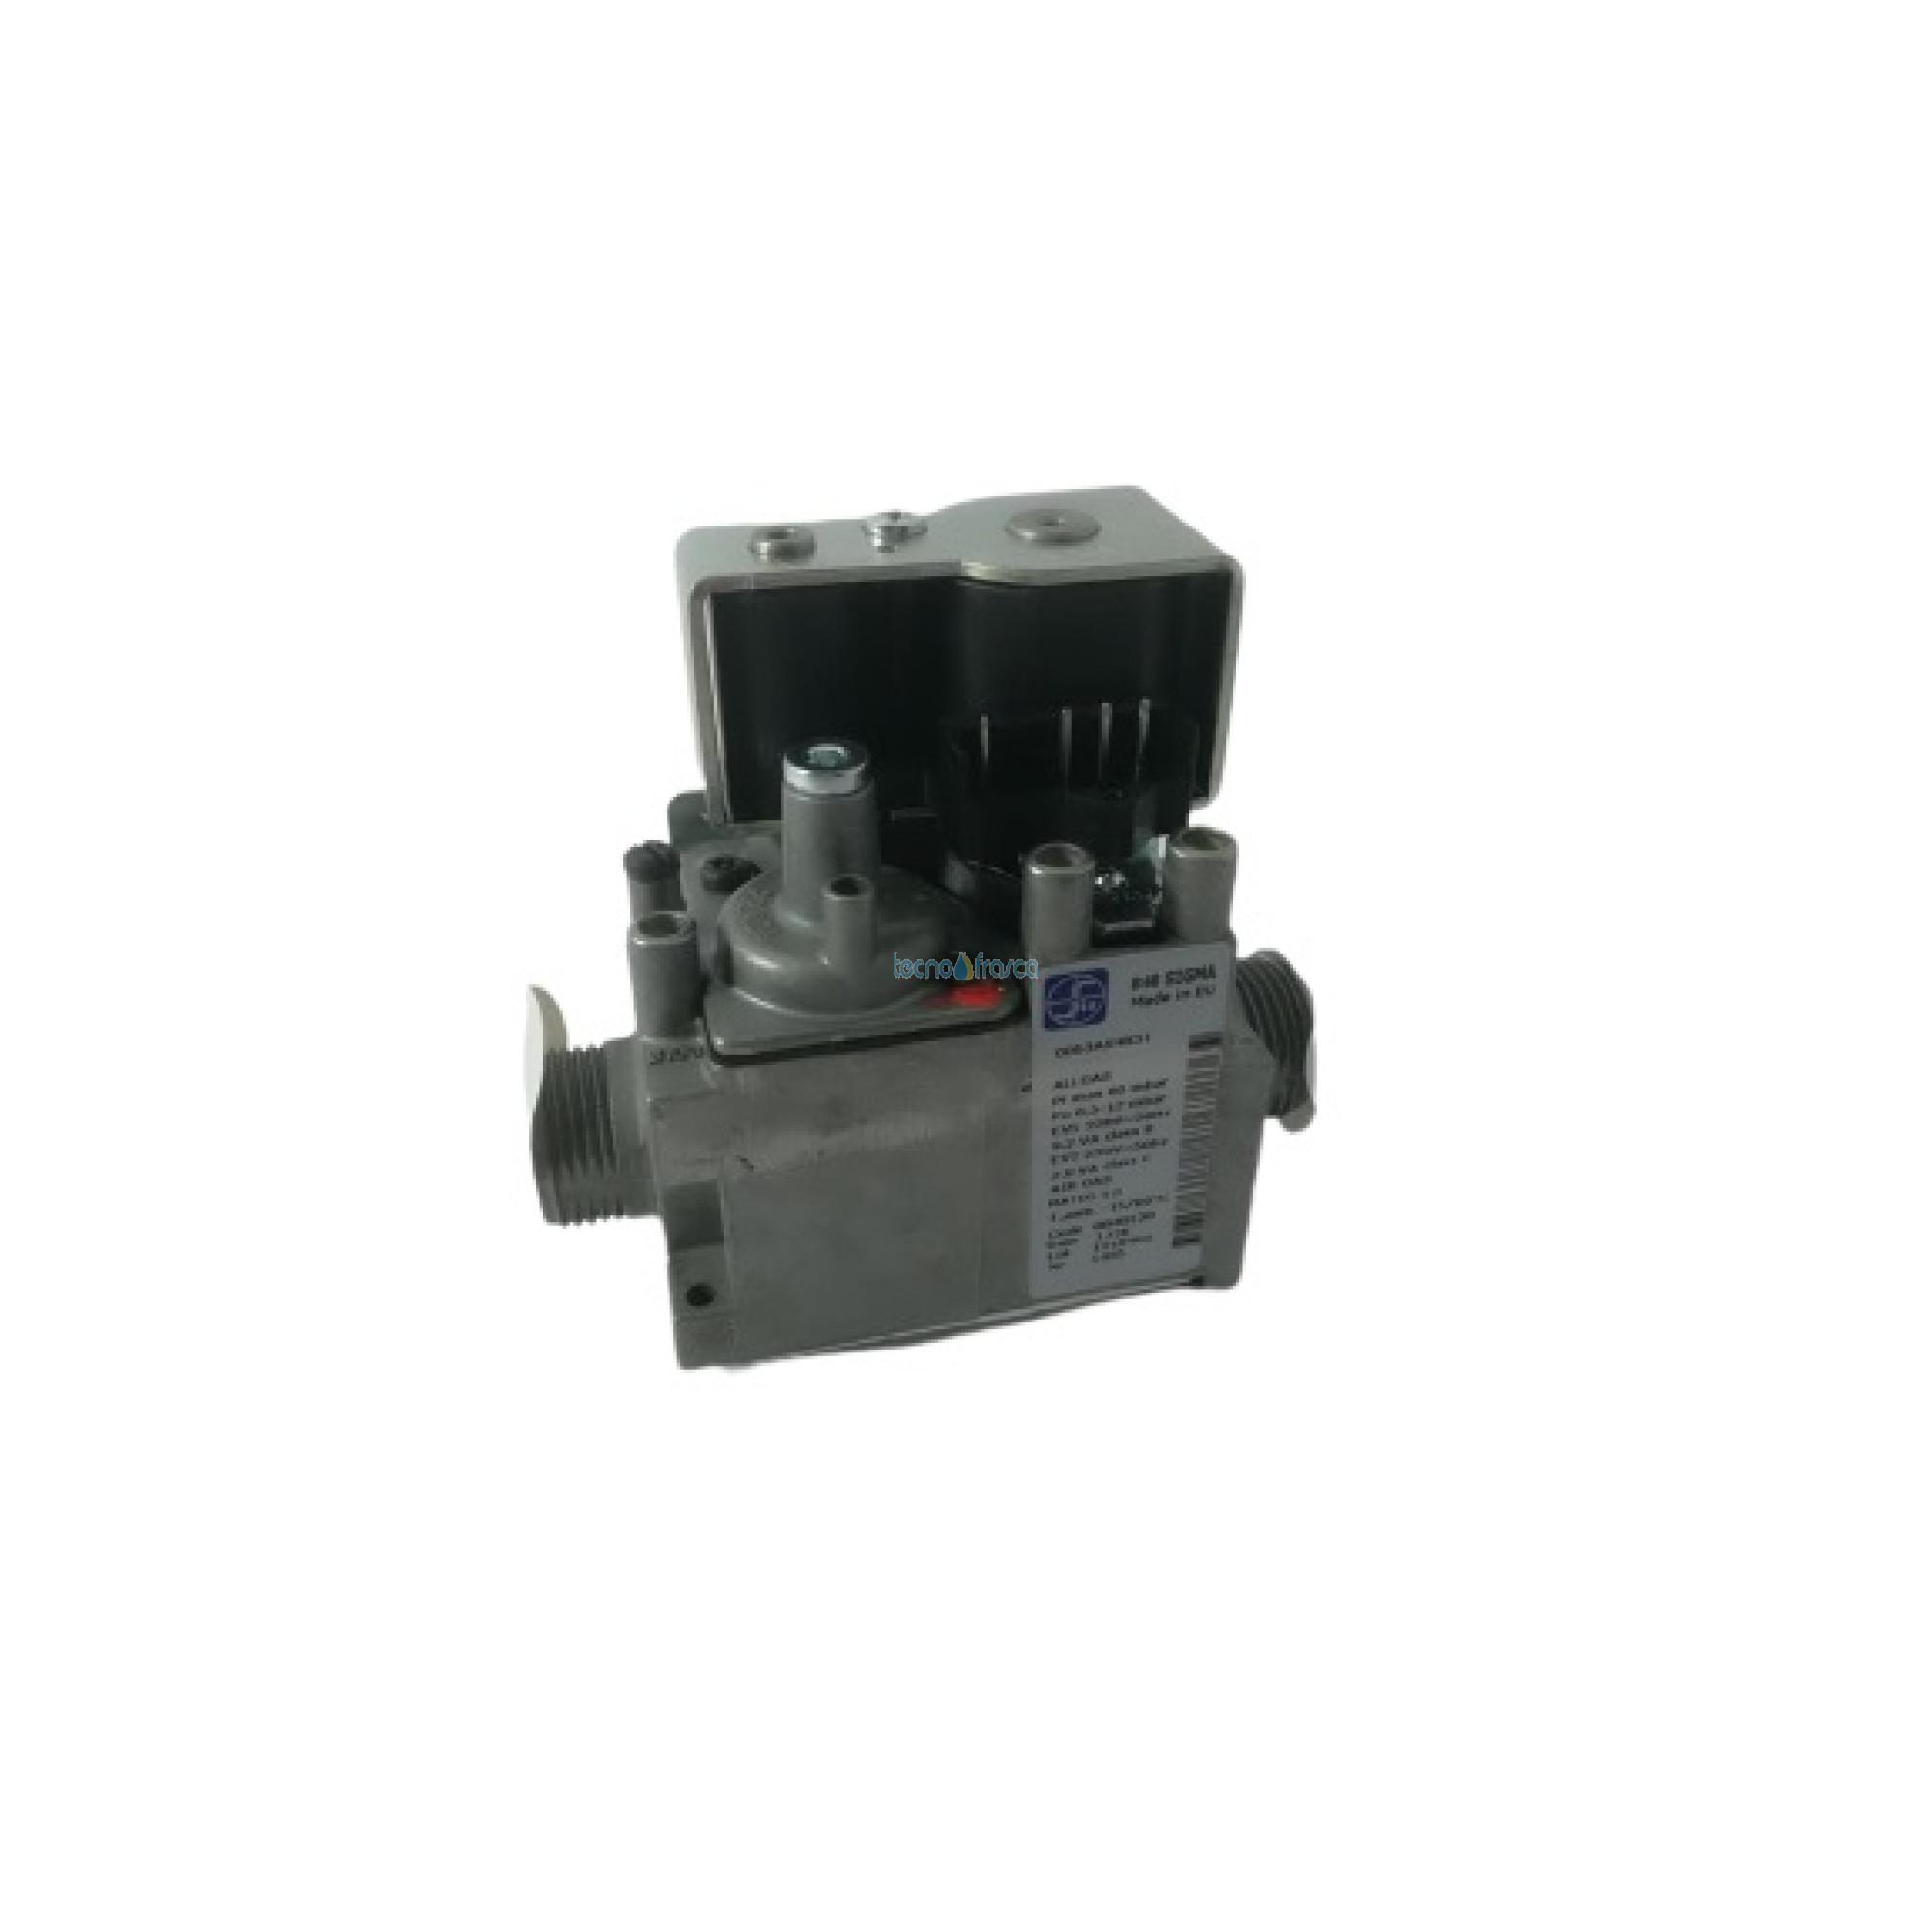 Immergas valvola gas 0848130 c/regolatore di portata 230v 1.039626